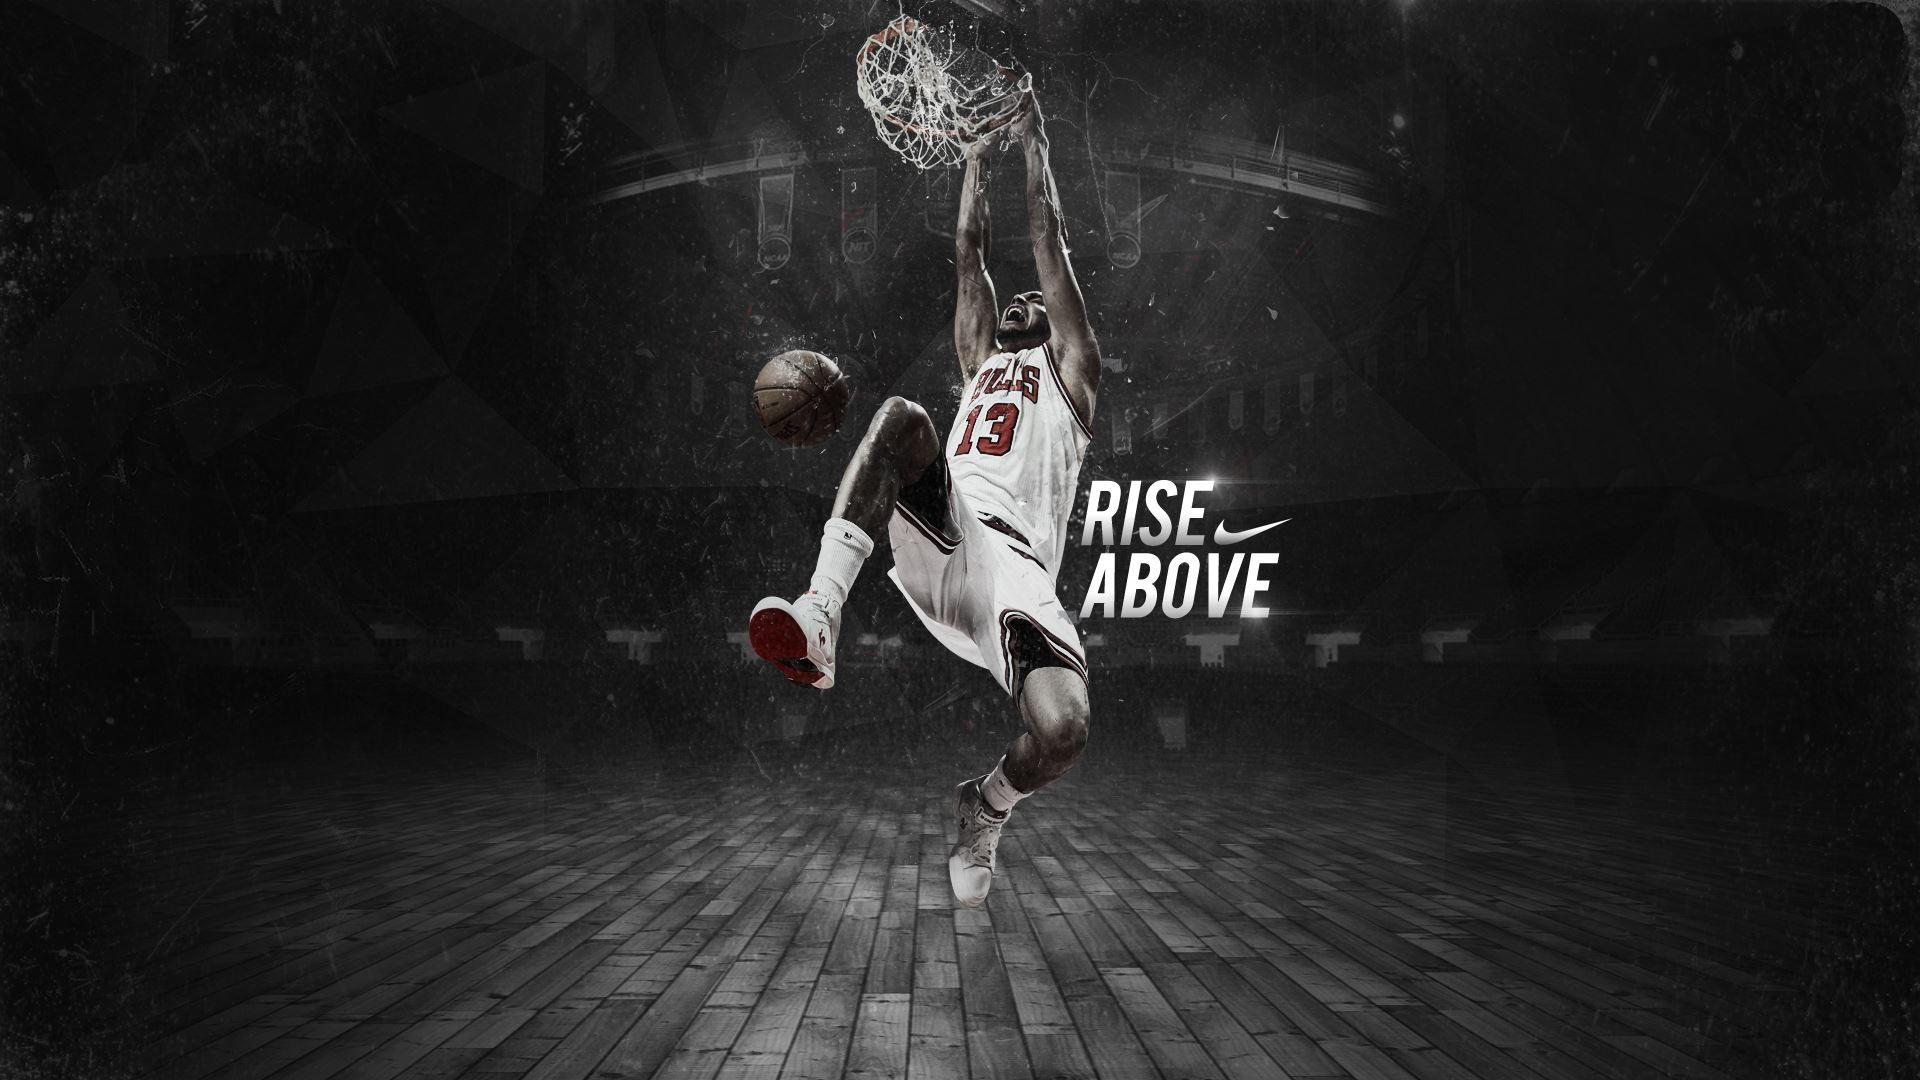 Nike Basketball Wallpaper 58 Images